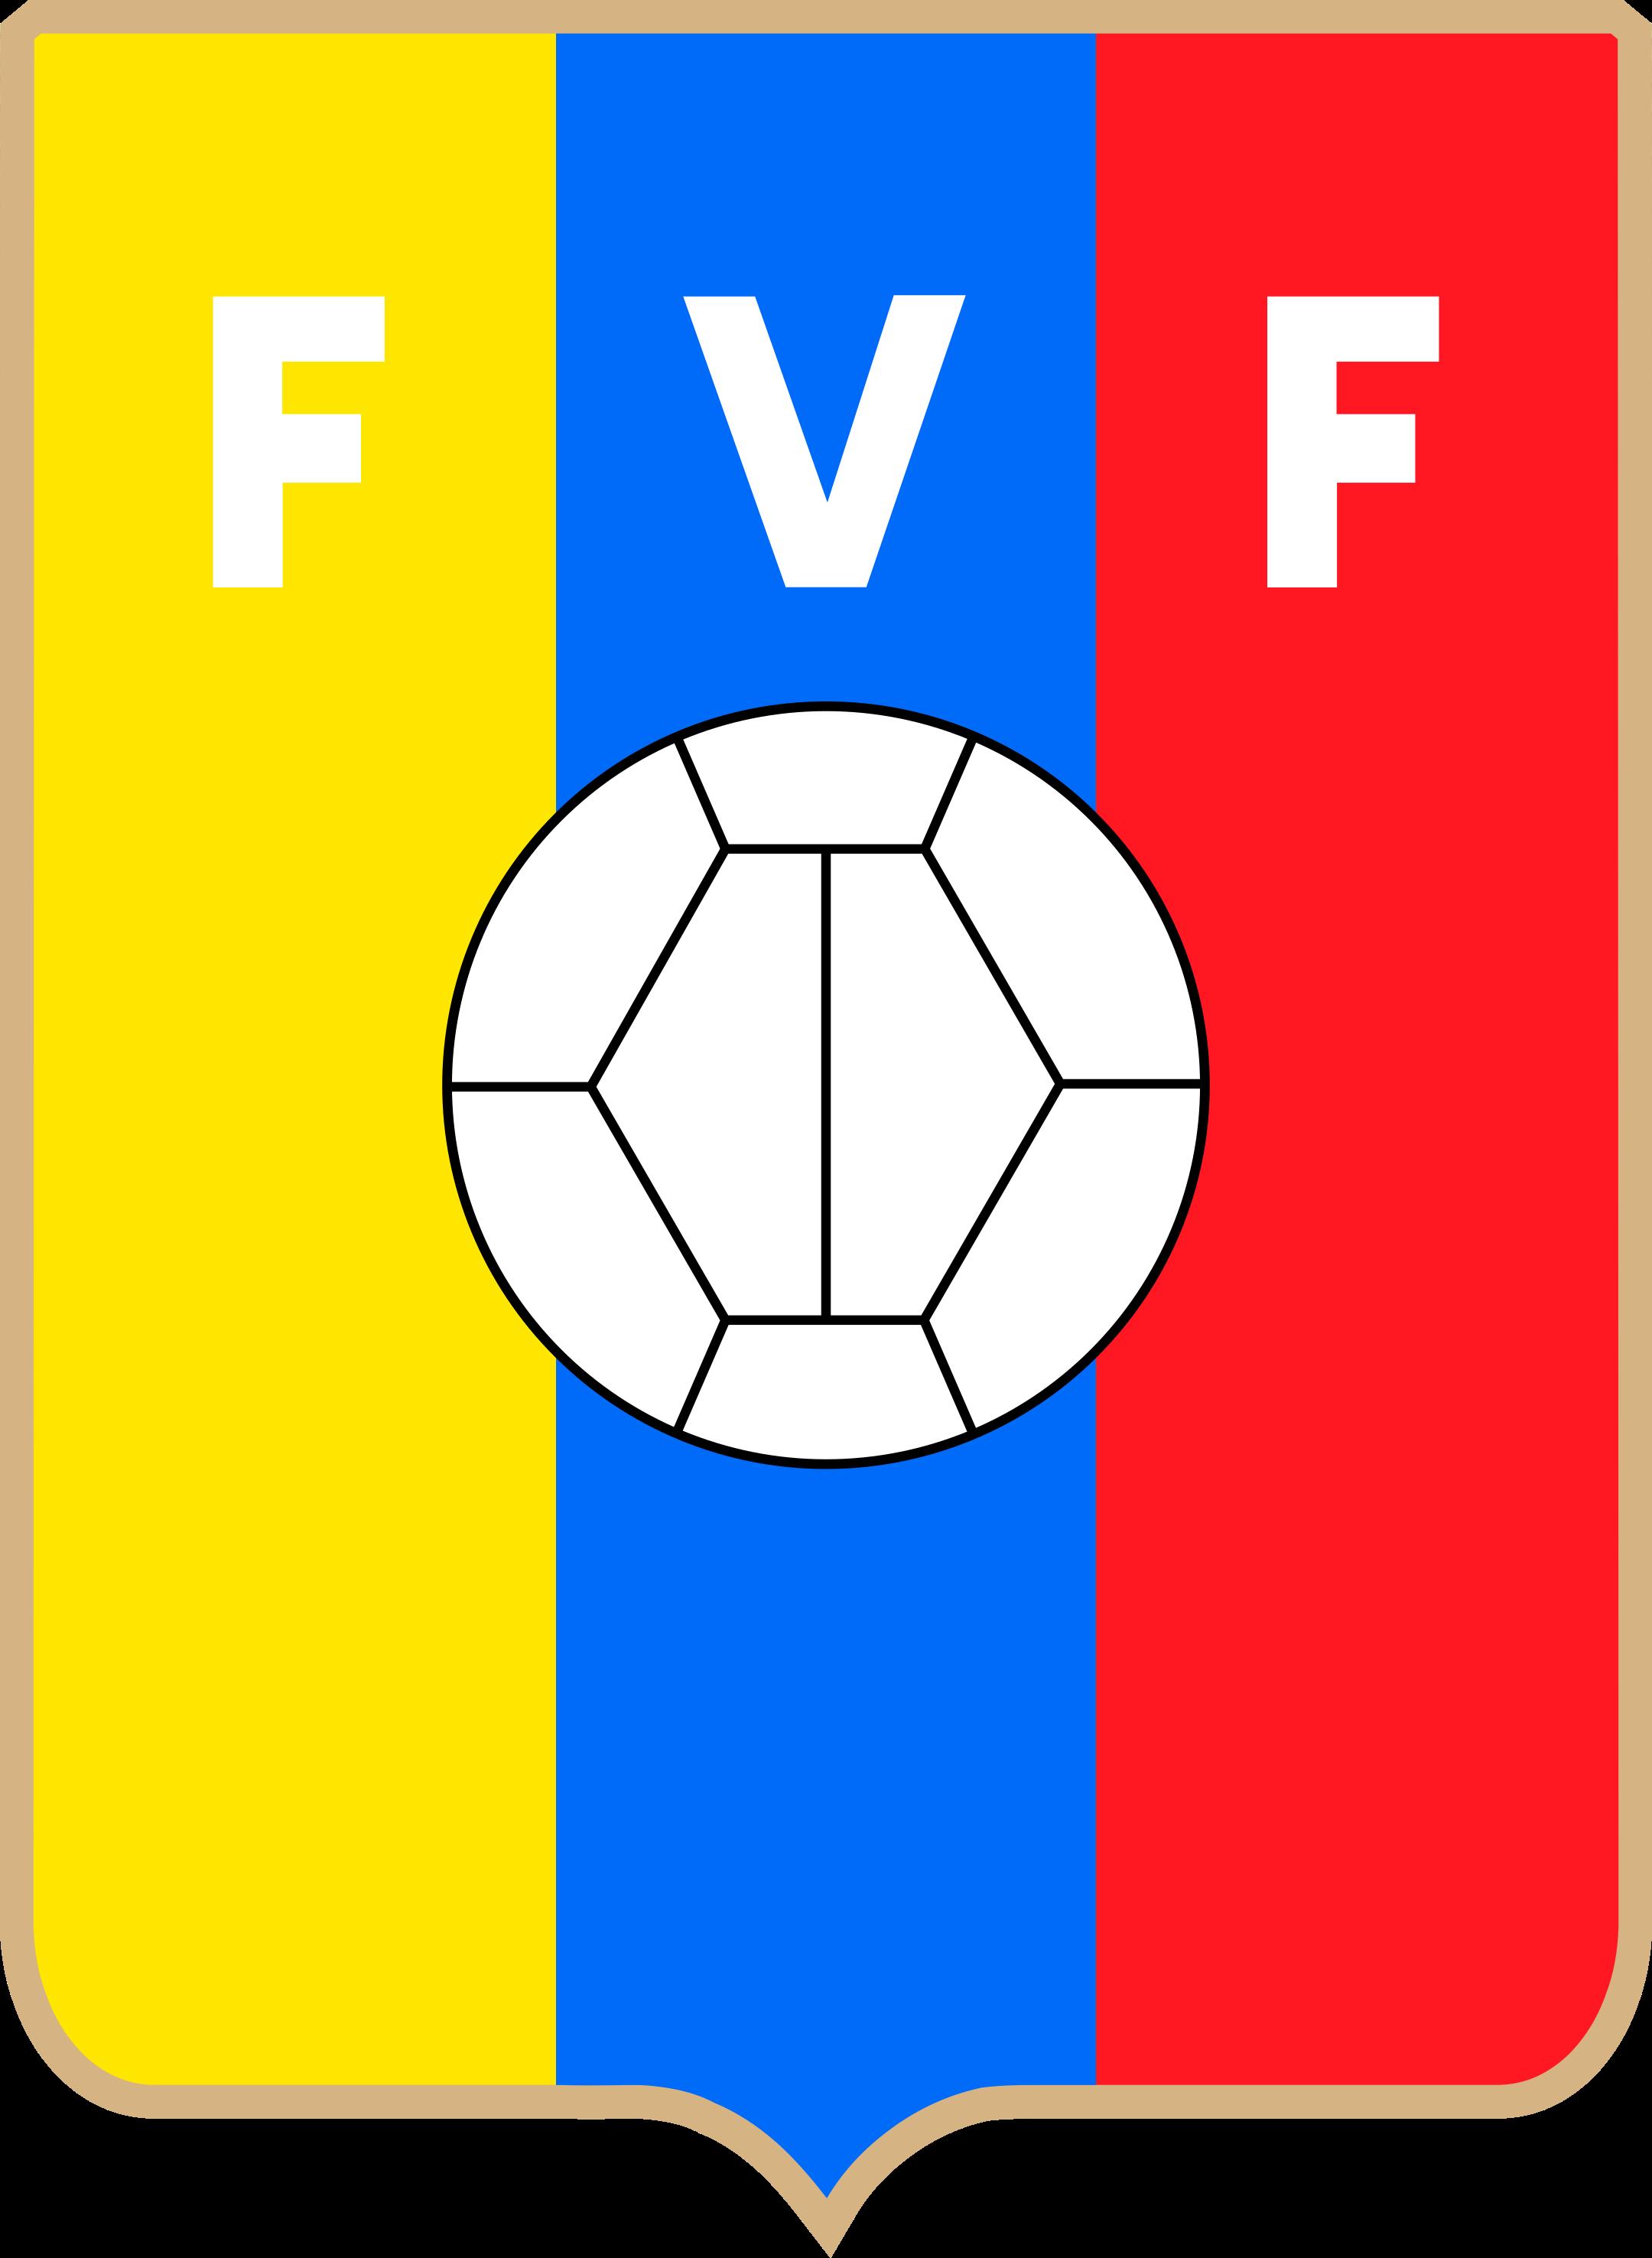 fvf seleccion de futbol de venezuela logo 1 - FVF Logo - Selección de fútbol de Venezuela Logo